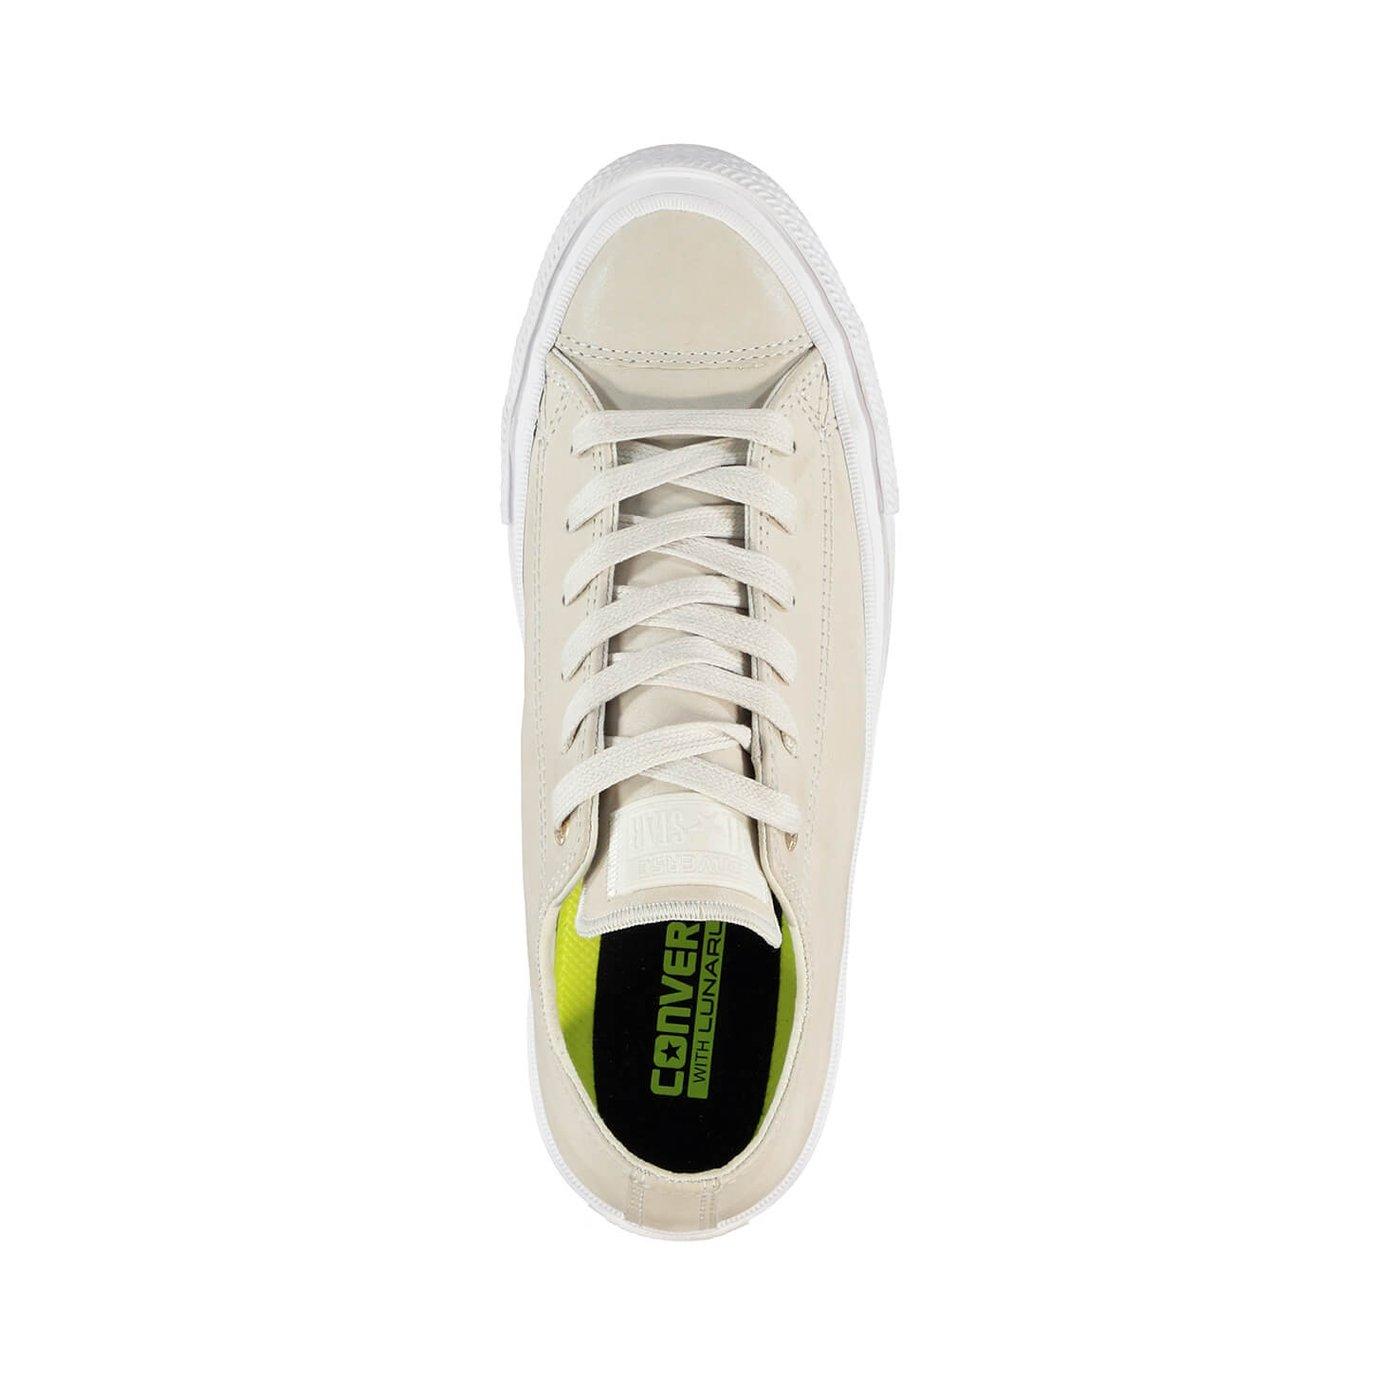 Converse Chuck Taylor All Star II Kadın Krem Sneaker